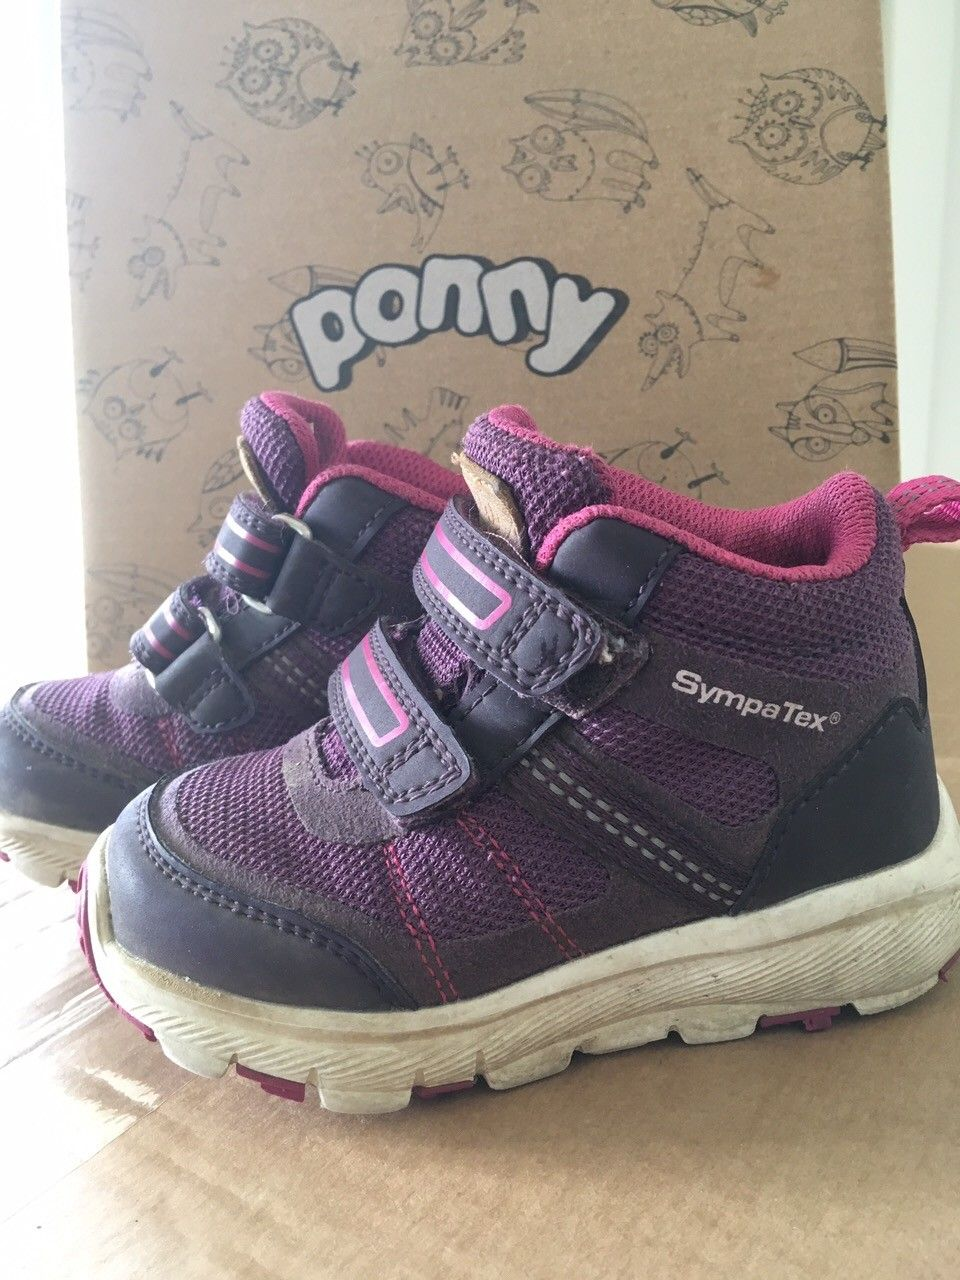 Ponny Goretex sko, høye str 22 | FINN.no